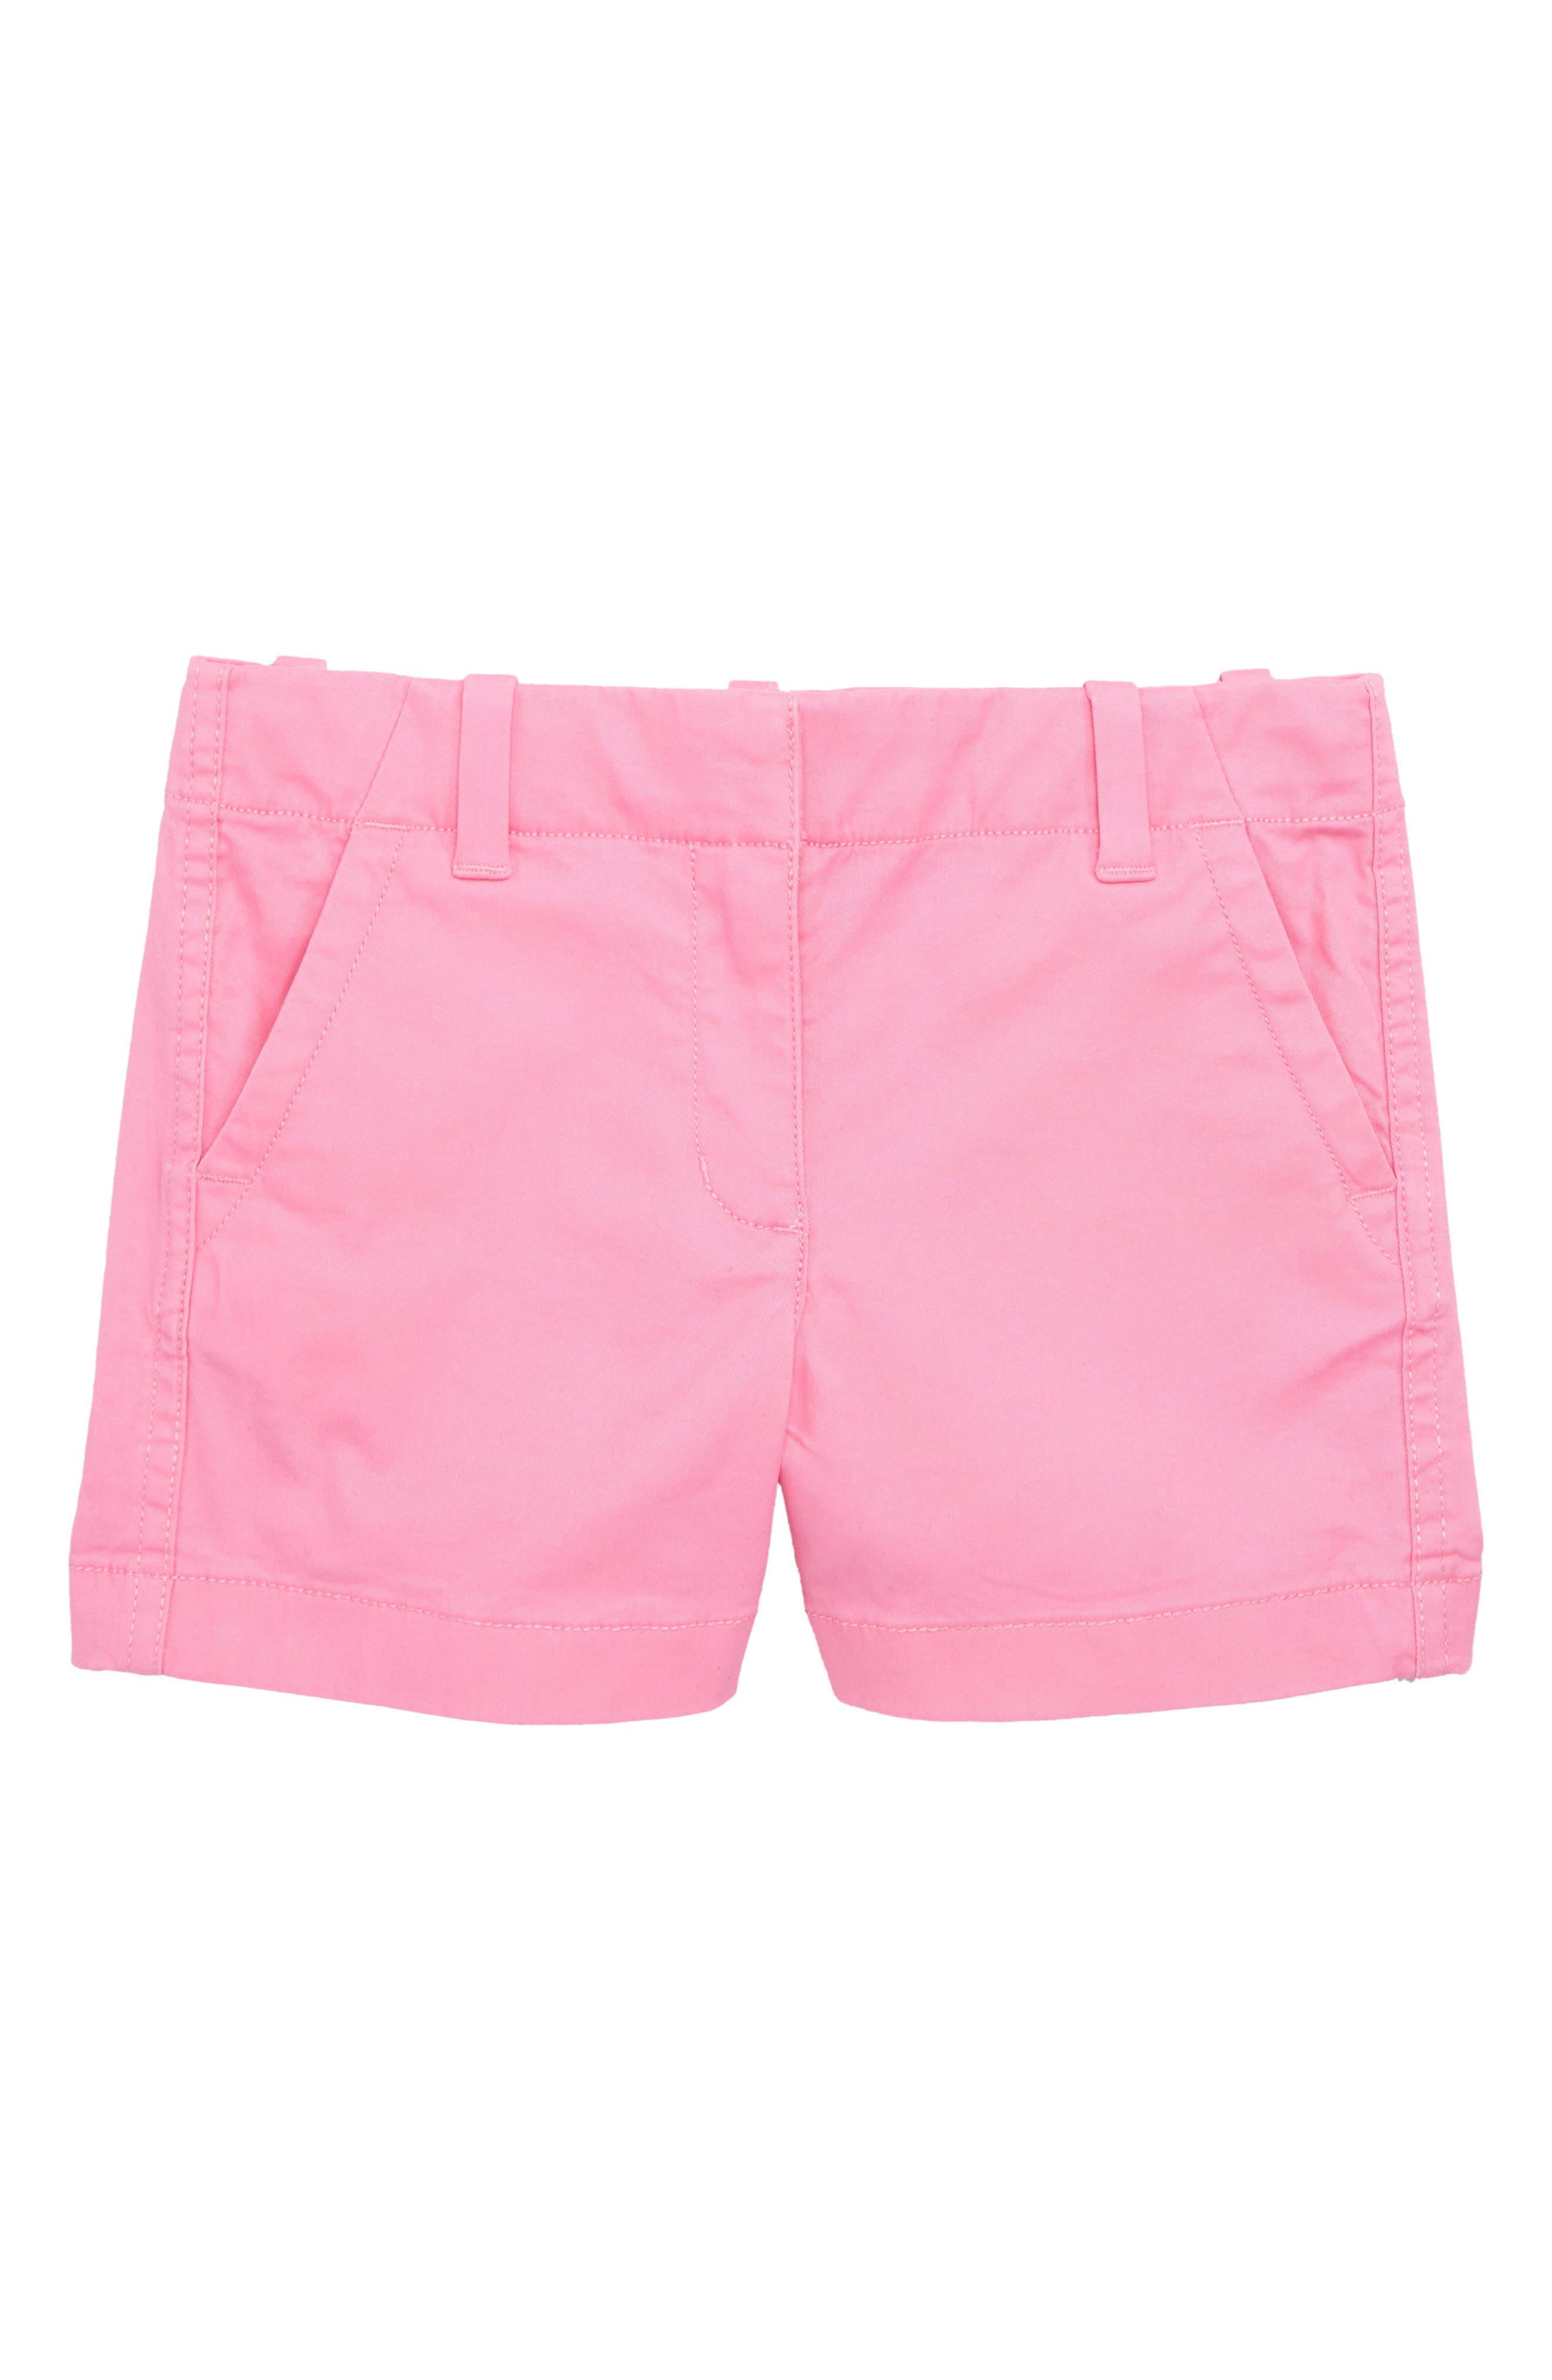 Everyday Shorts,                         Main,                         color, Cupcake